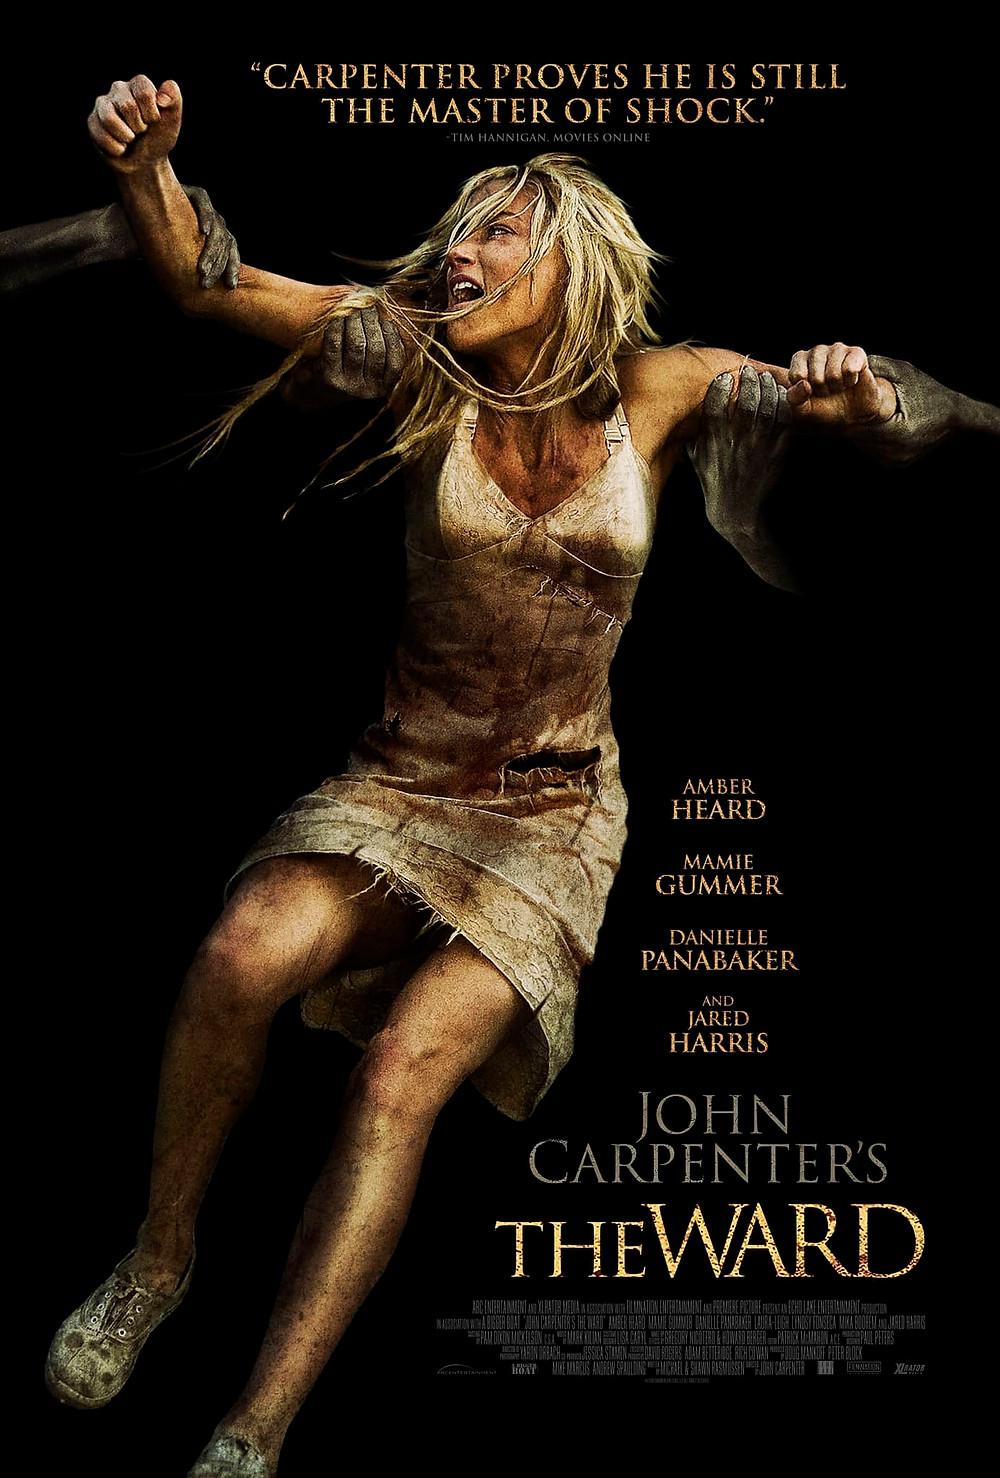 recenzie de film The Ward, John Carpenter